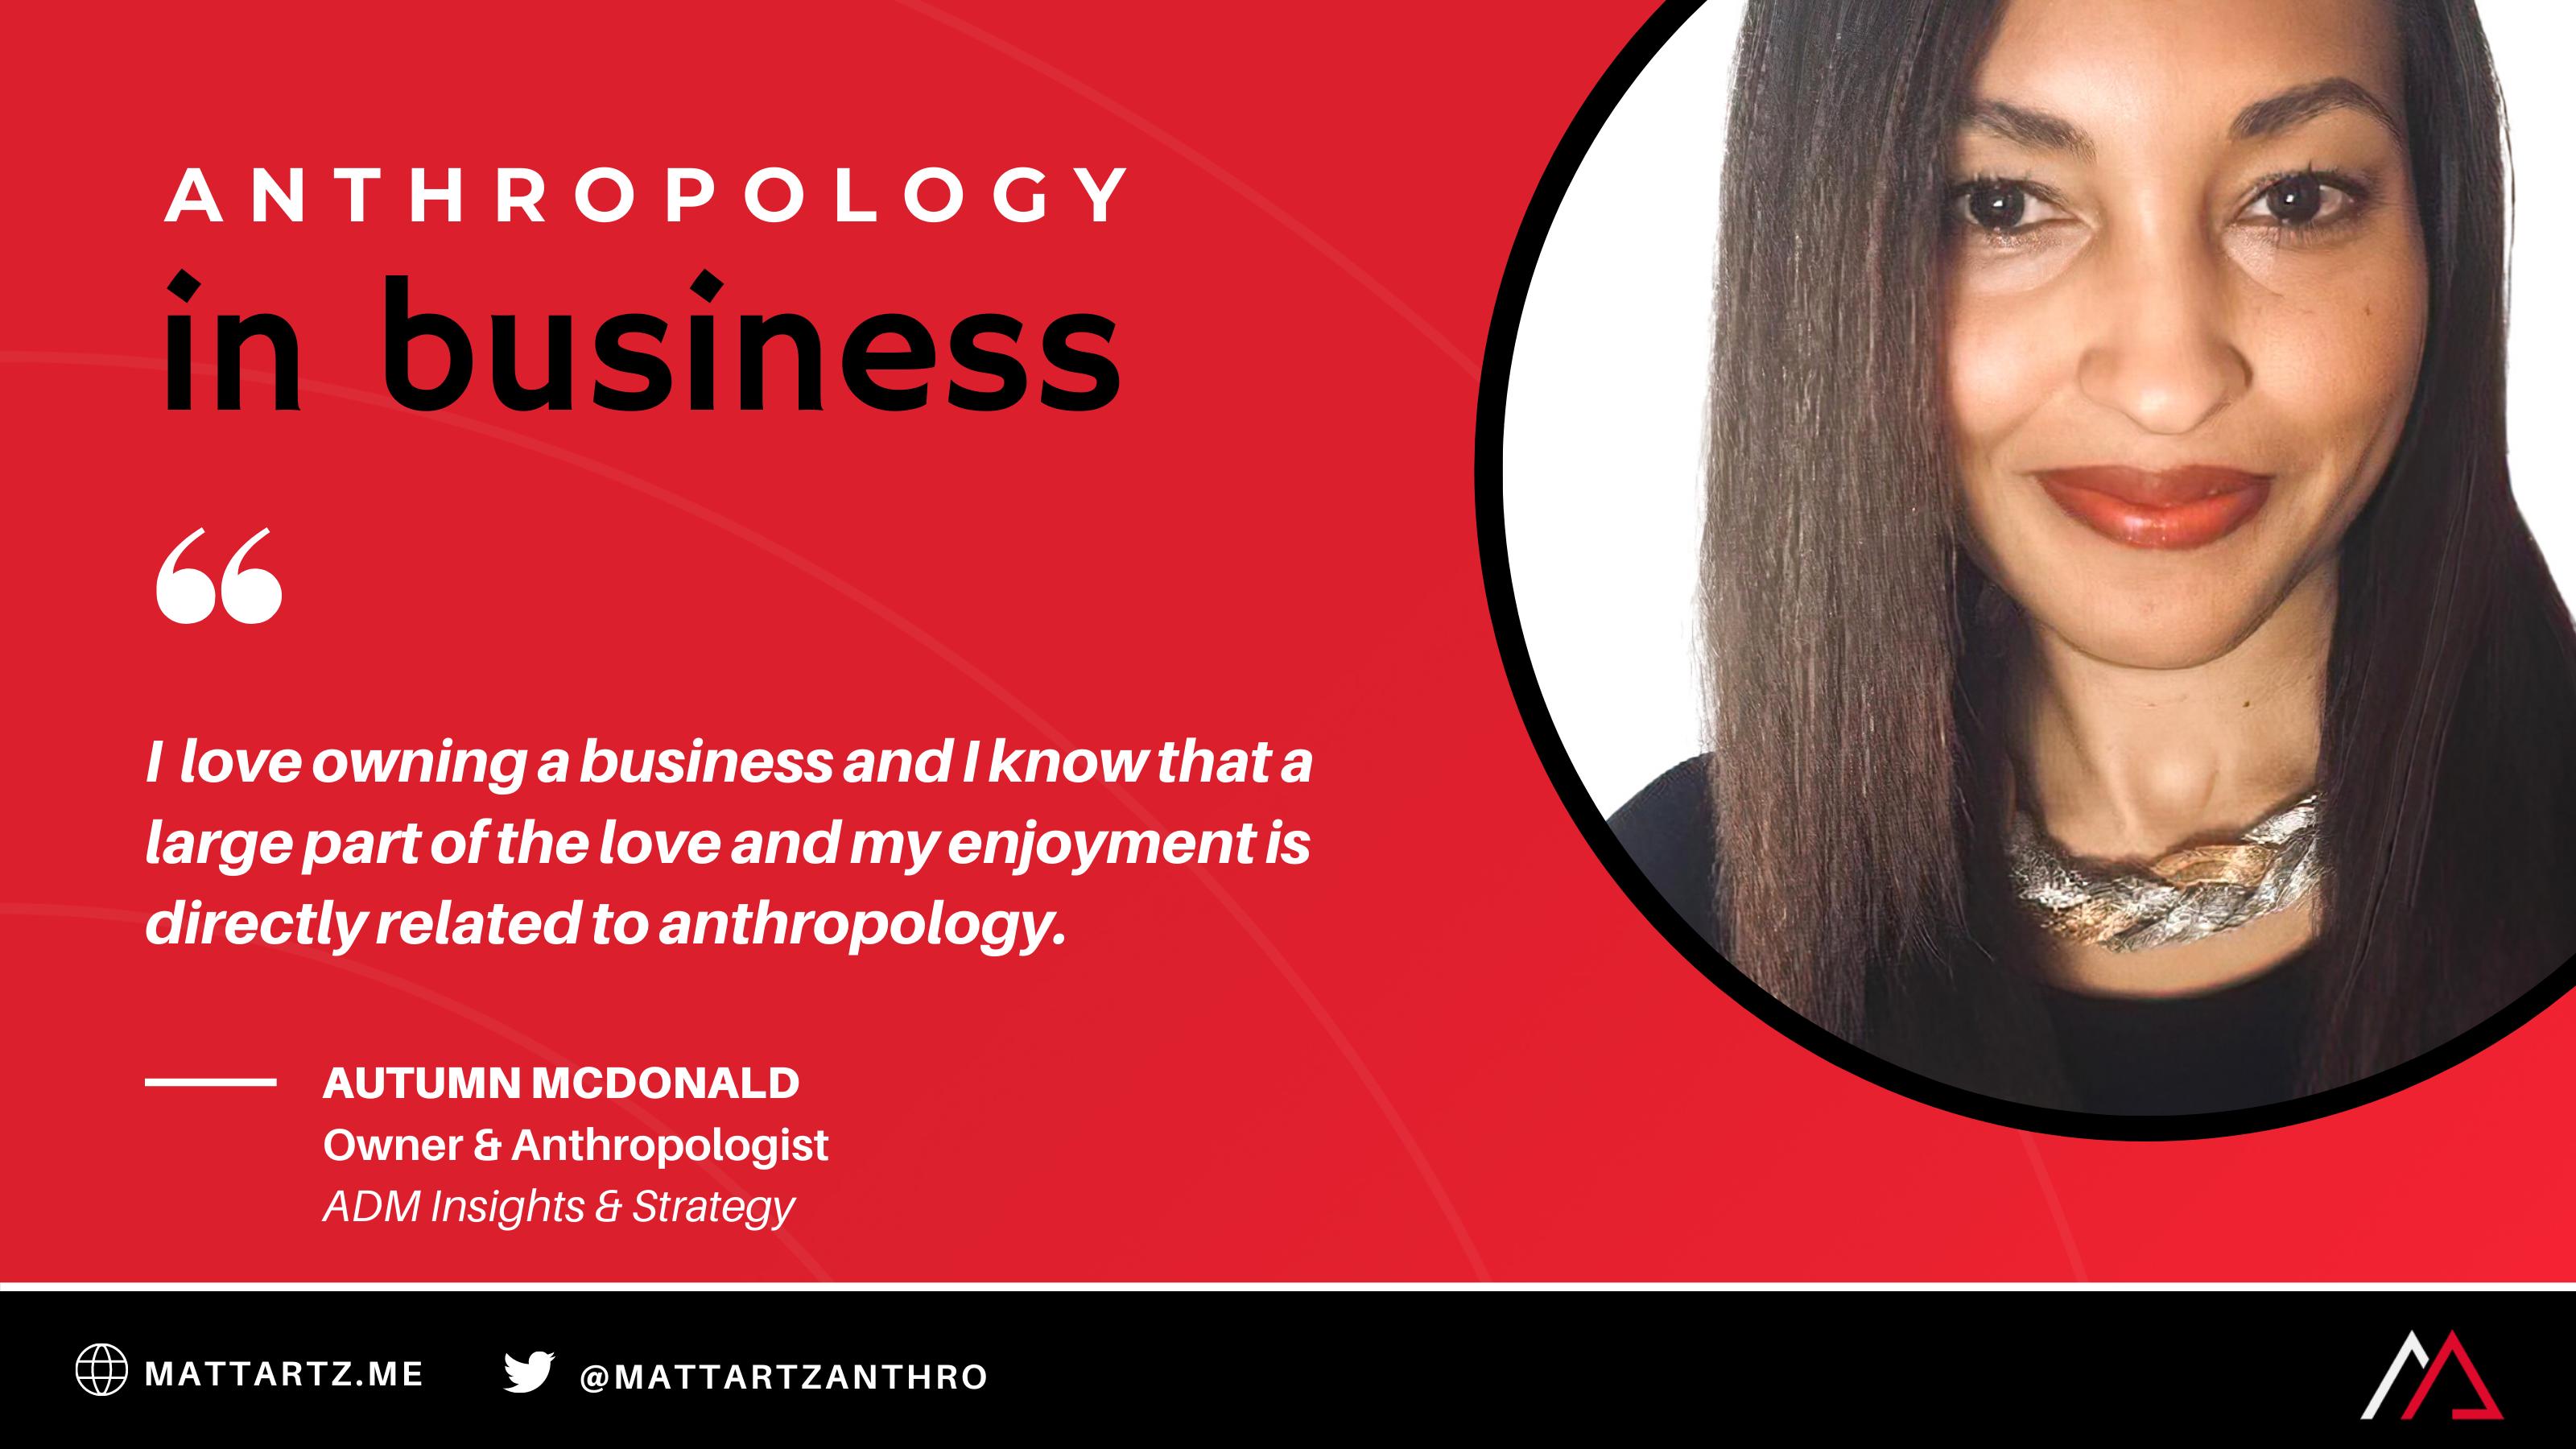 Autumn McDonald on Anthropology in Business with Matt Artz